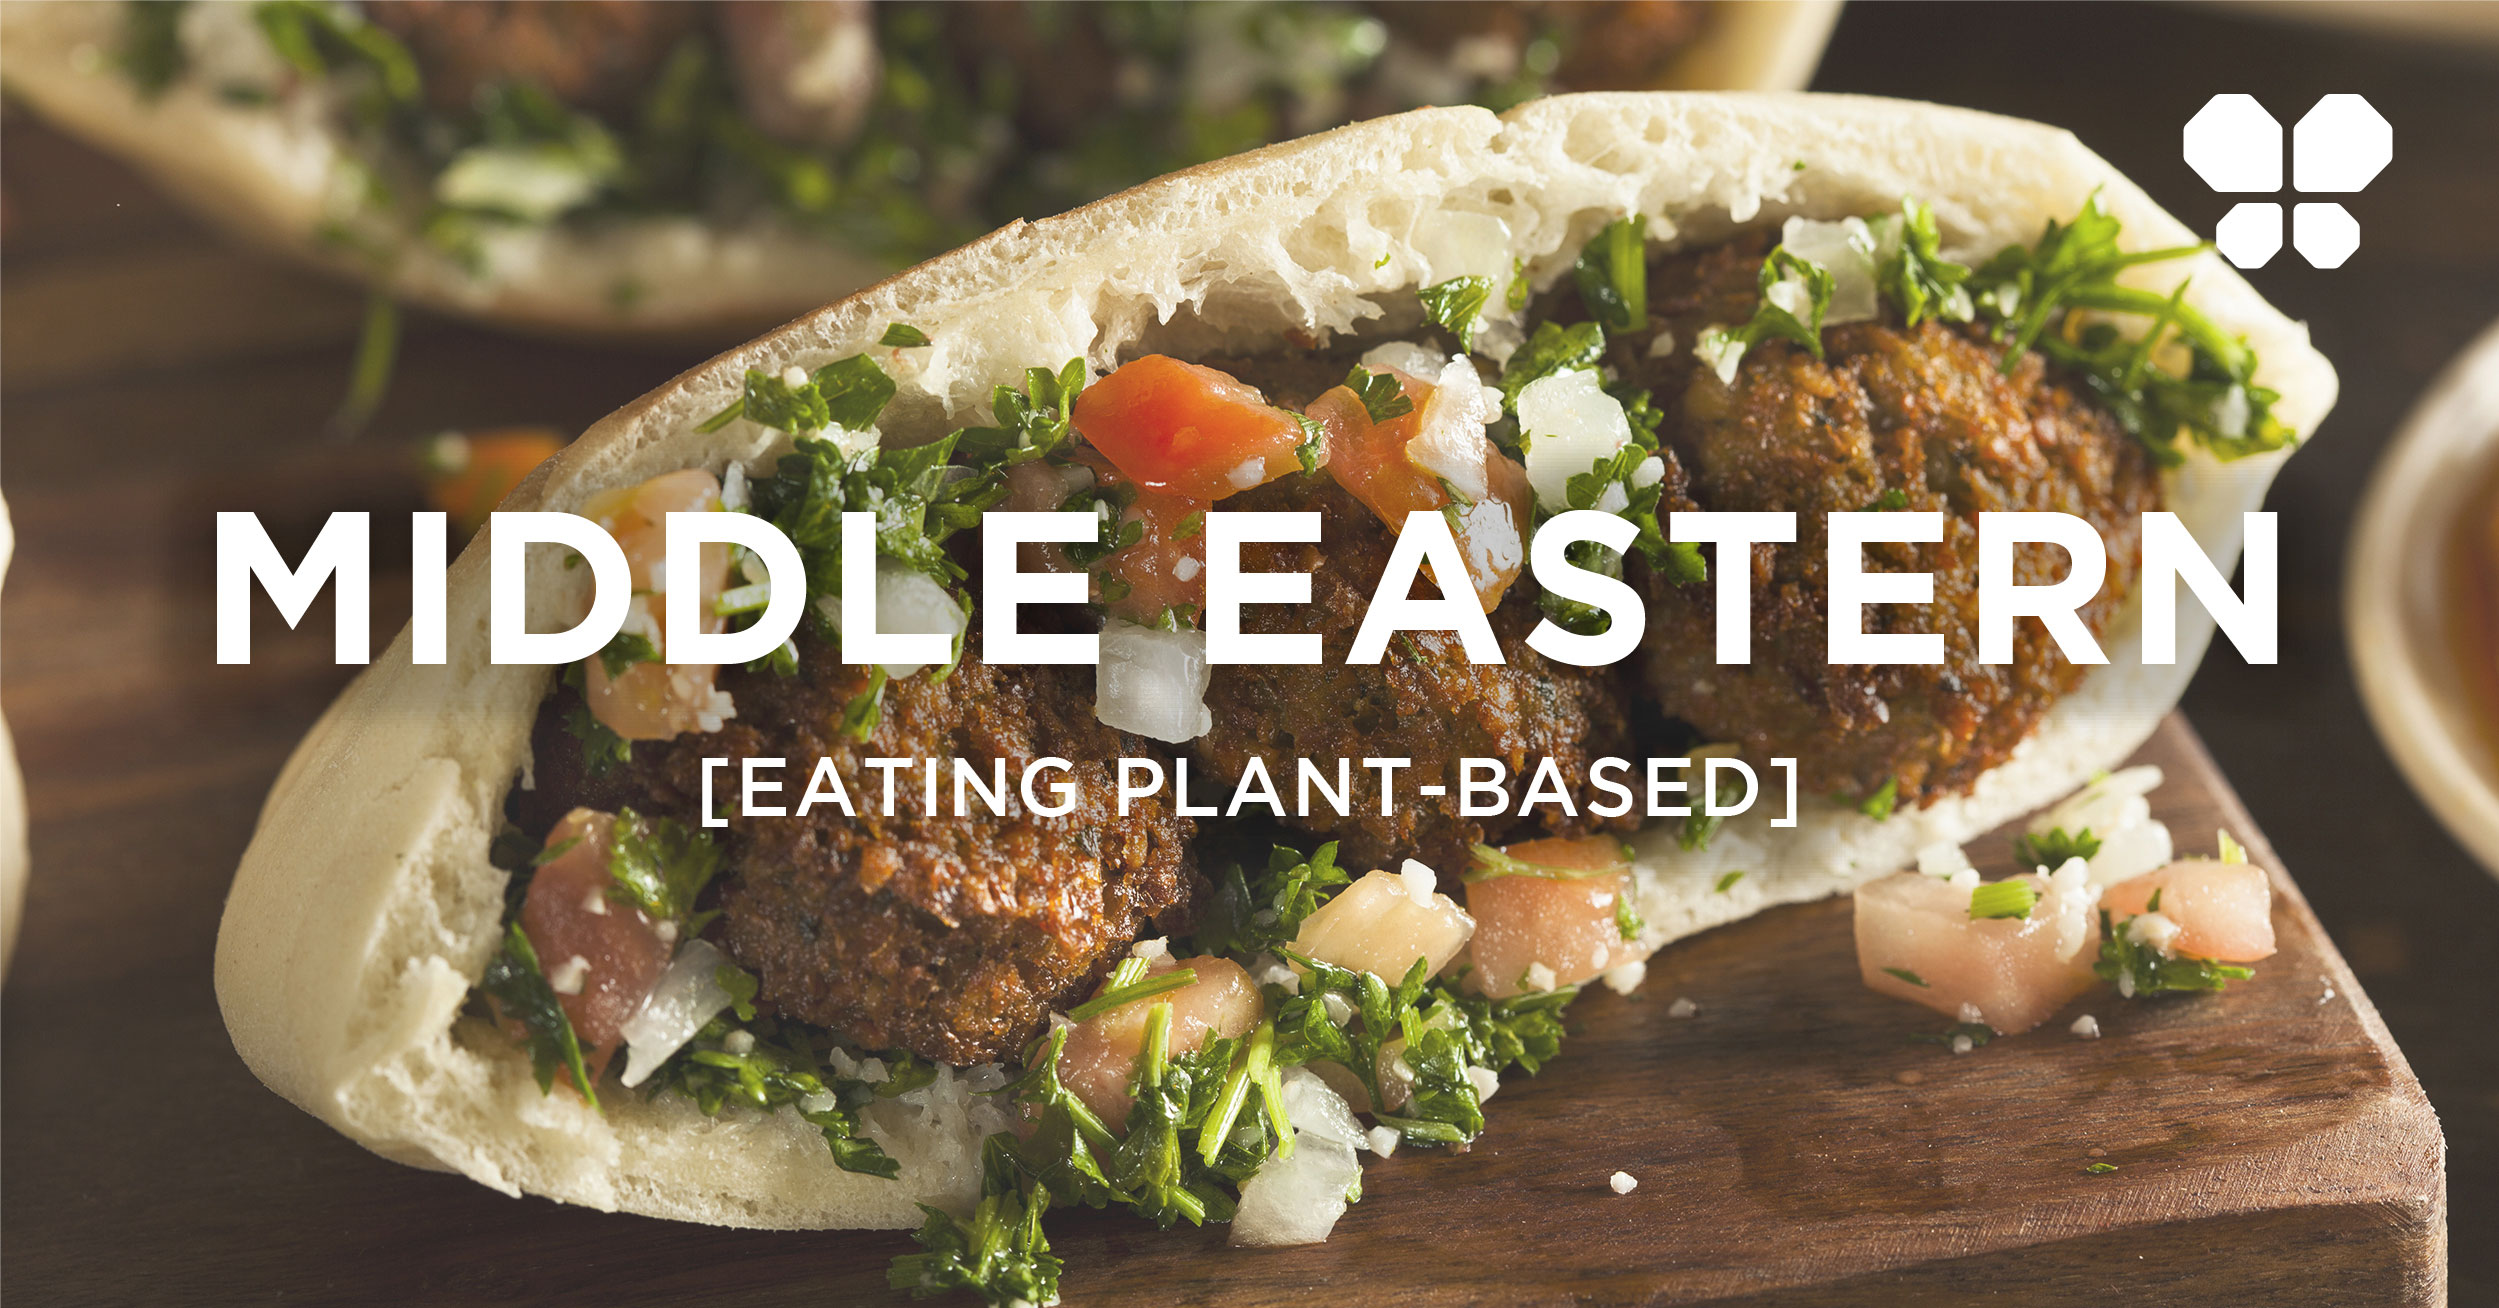 Eating out vegan Middle Eastern or vegan Mediterranean cuisine. Plant-based tips for eating Middle Eastern food.